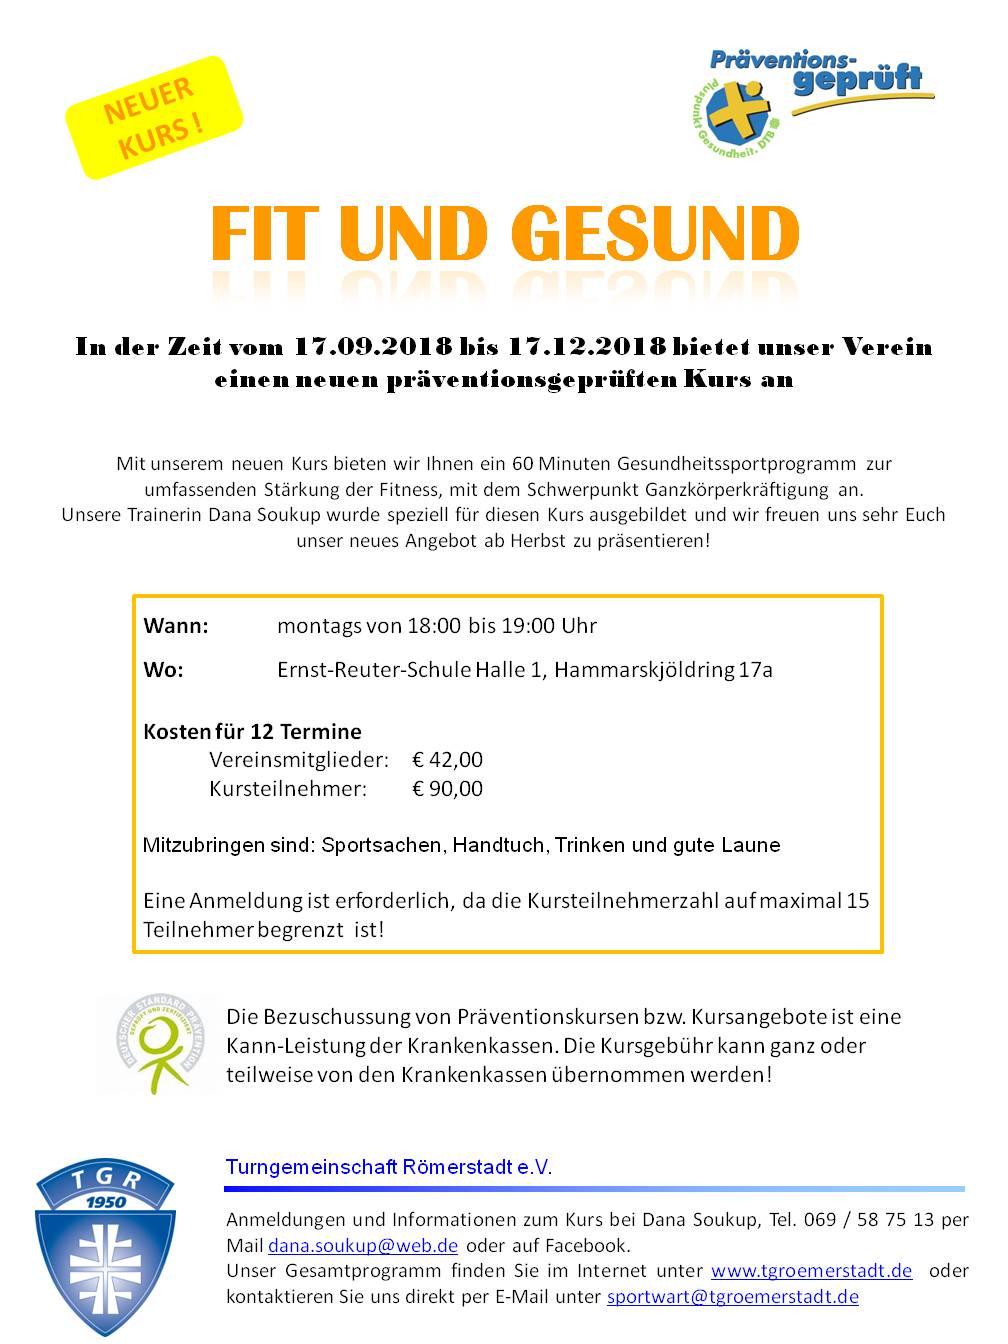 Tg Romerstadt Sportangebote Steckbrief